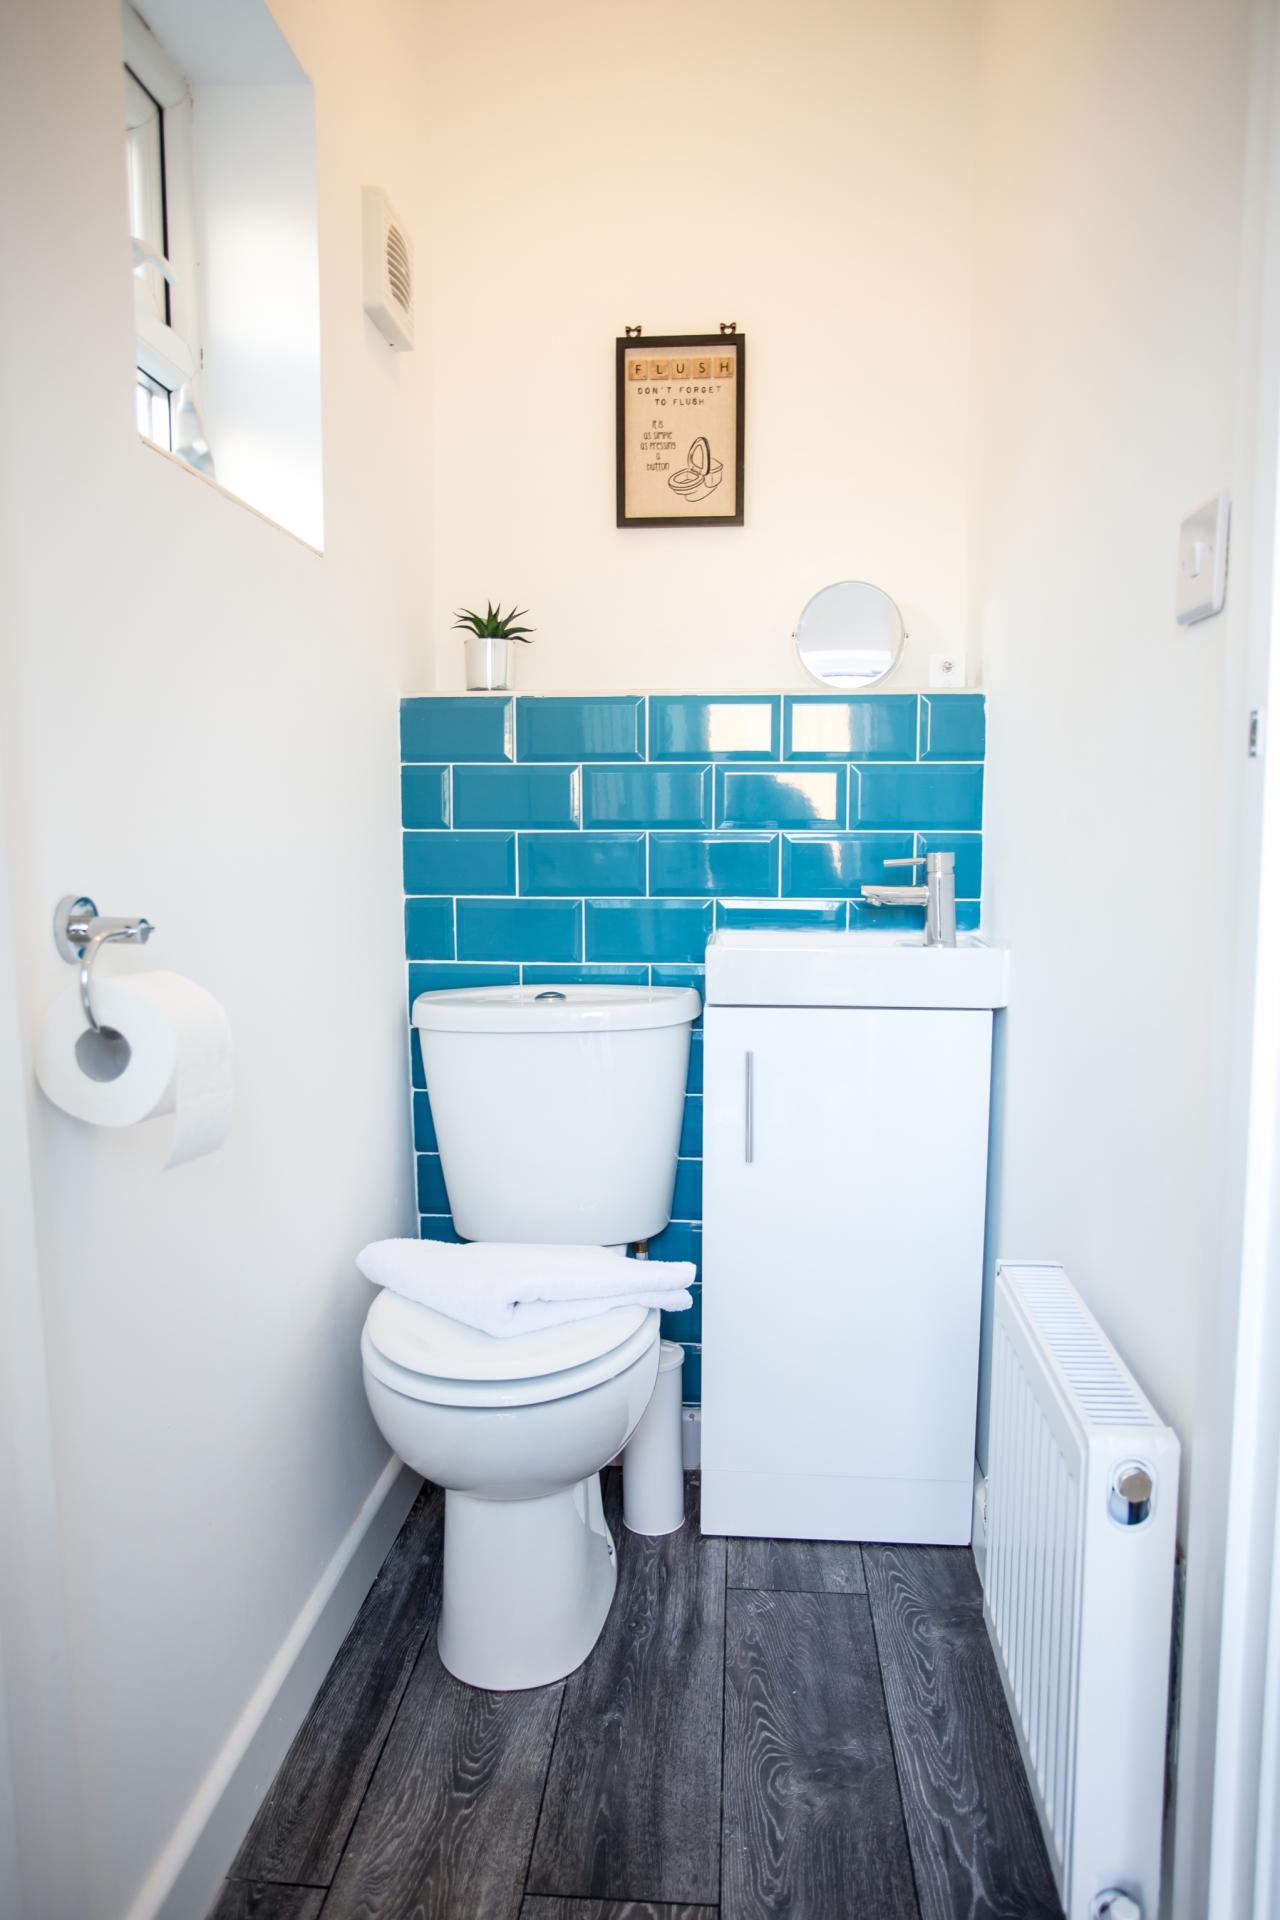 Toilet at Comfort House Tamworth